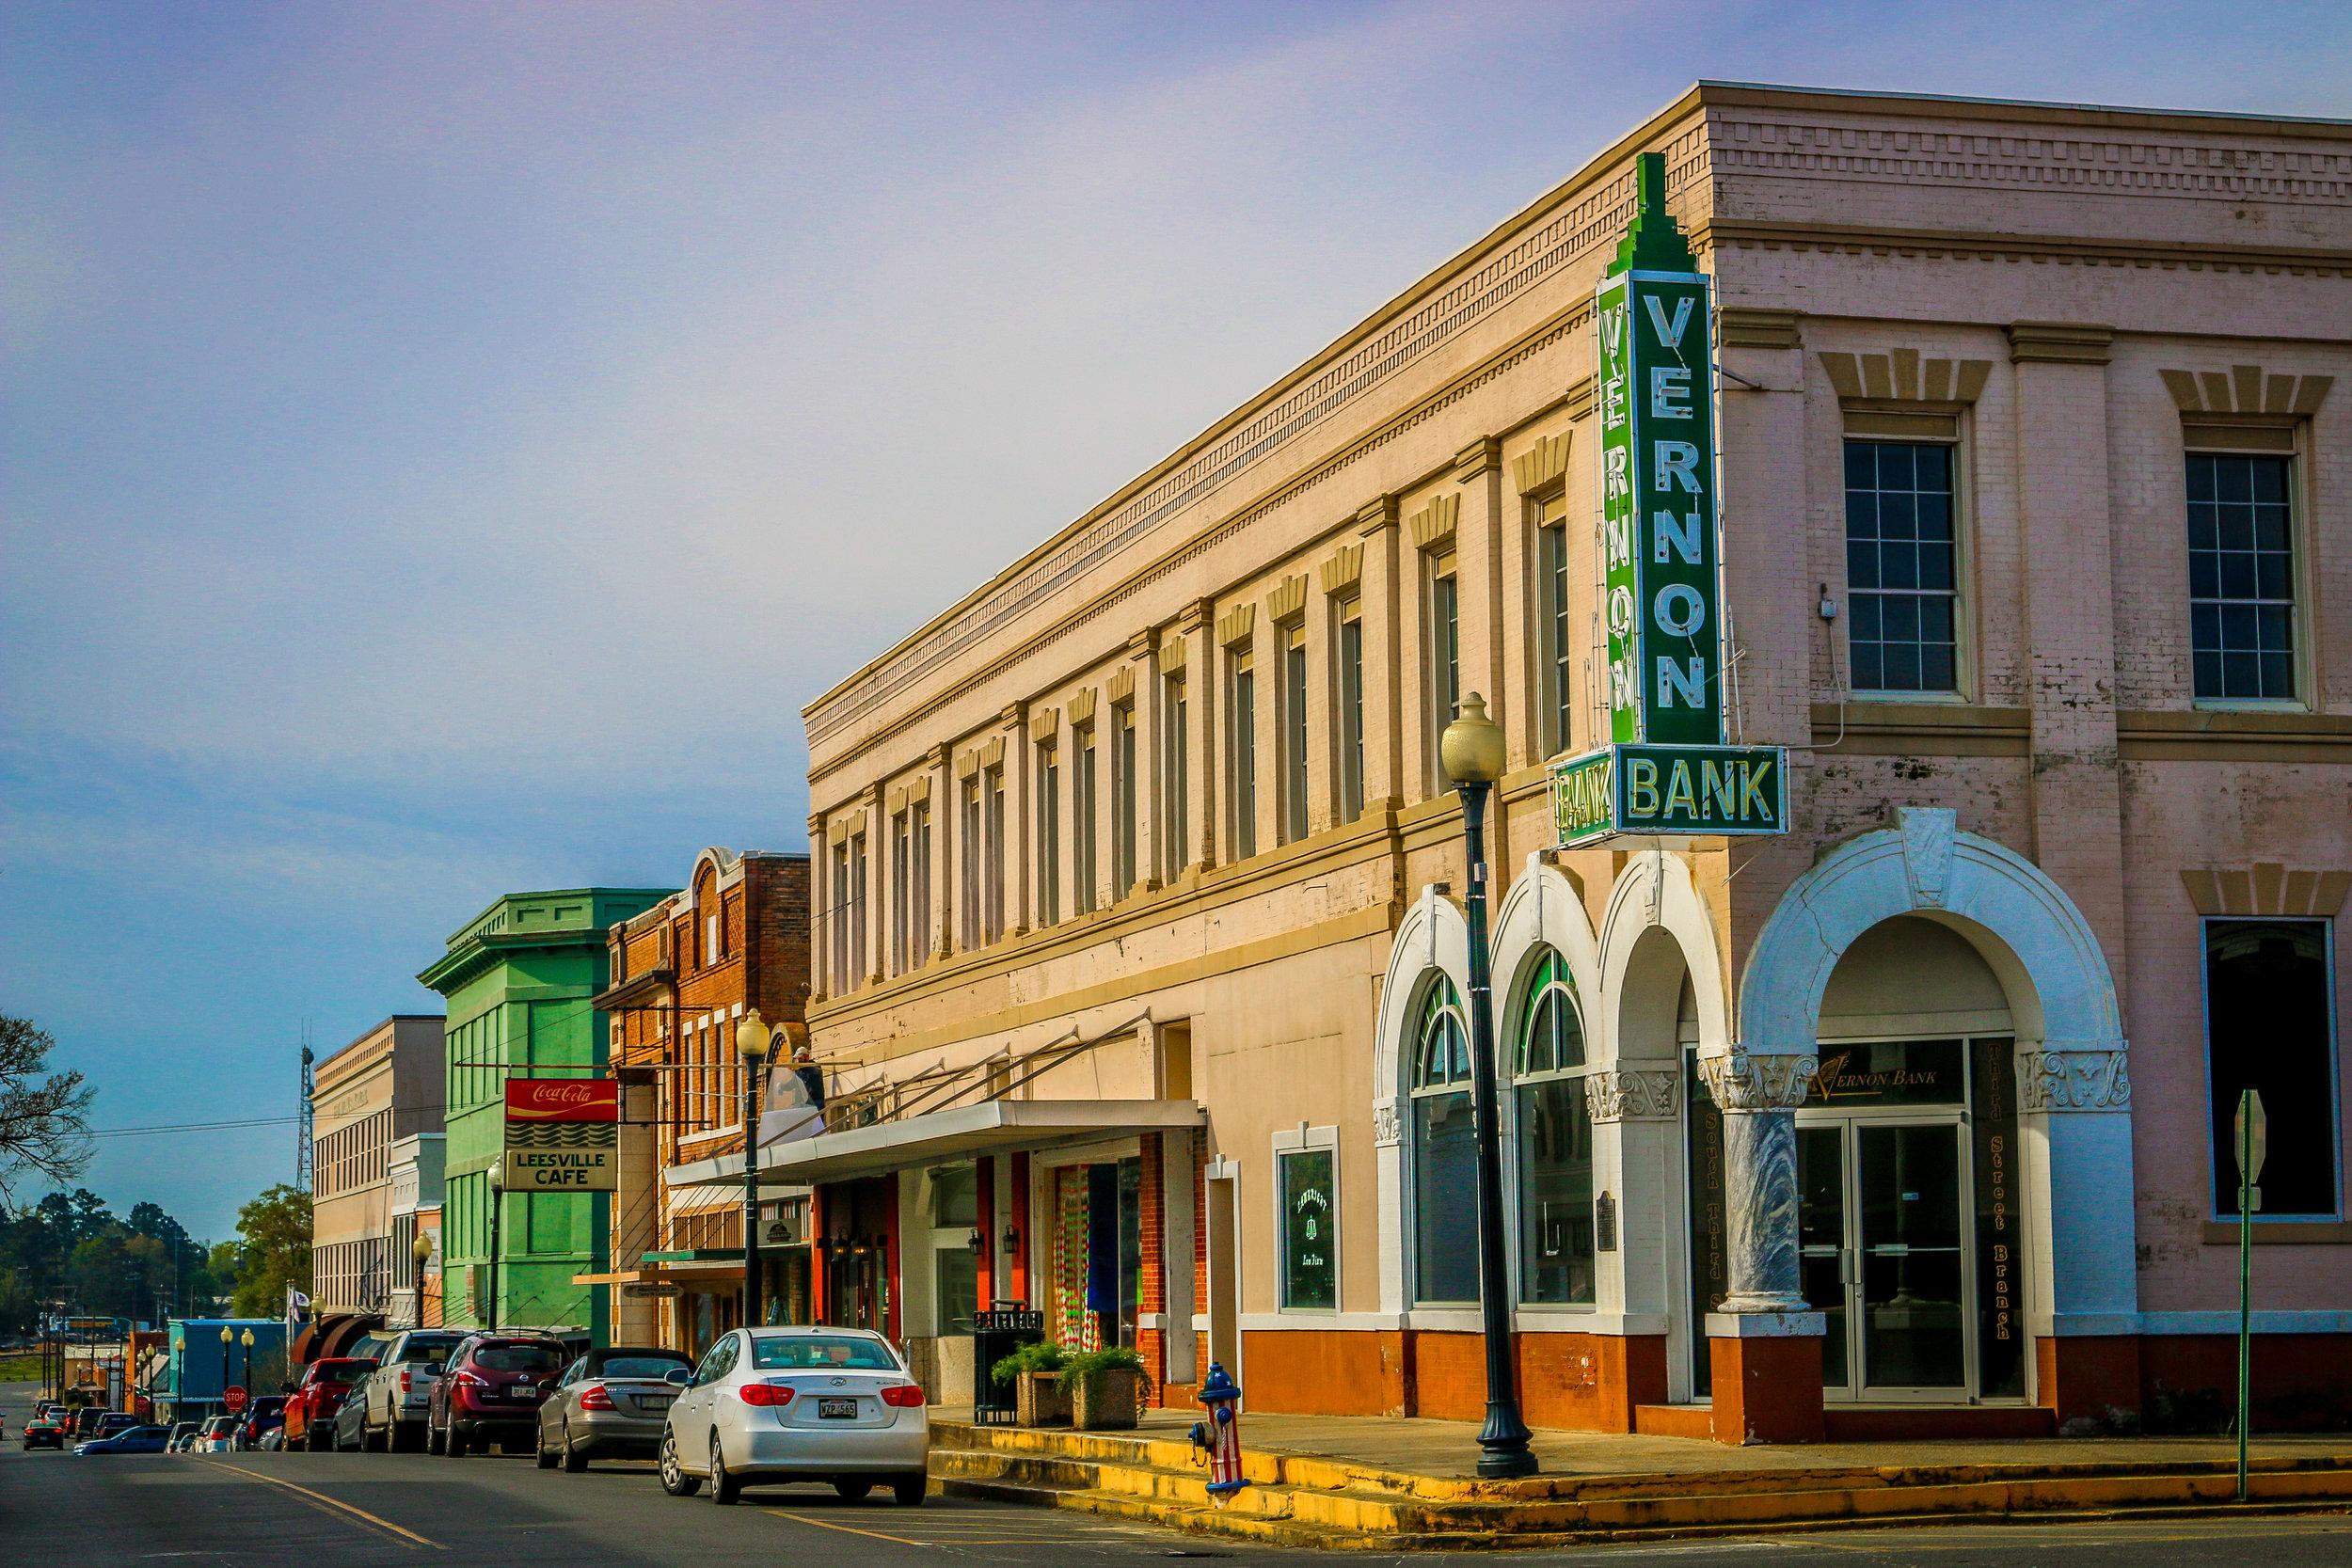 Downtown Leesville